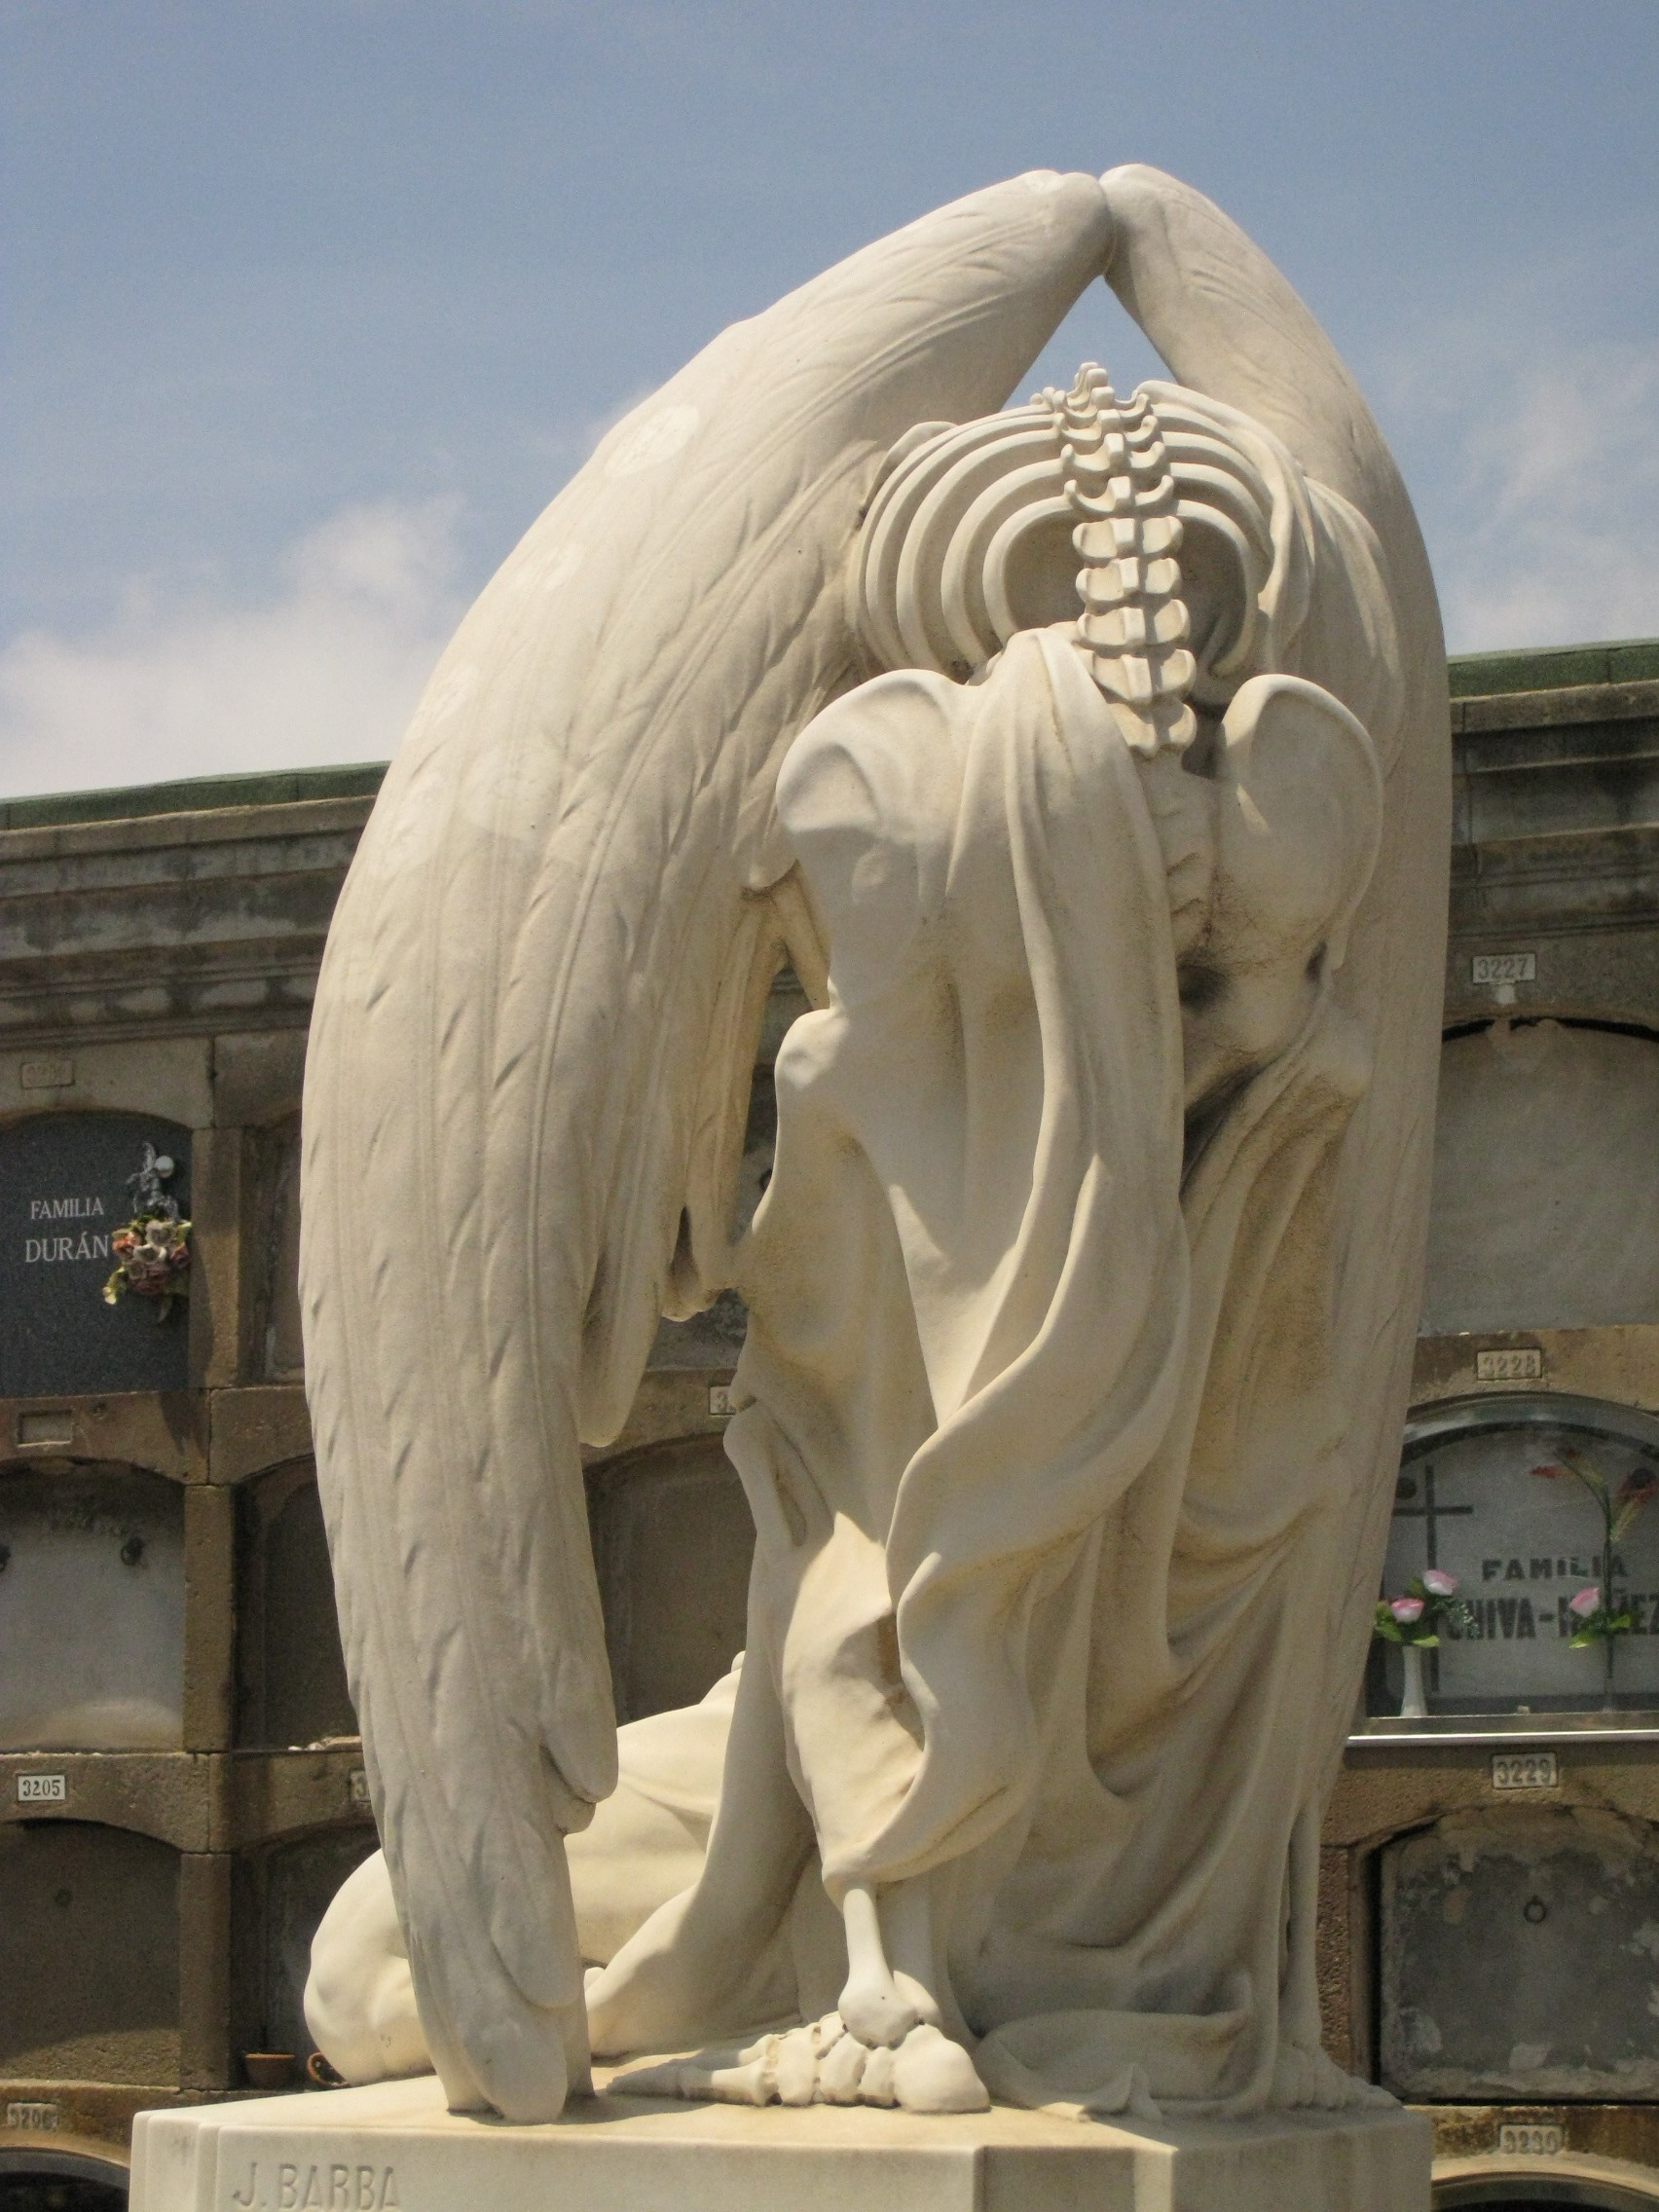 File:130 Cementiri del Poblenou, el Petó de la Mort.jpg - Wikimedia Commons